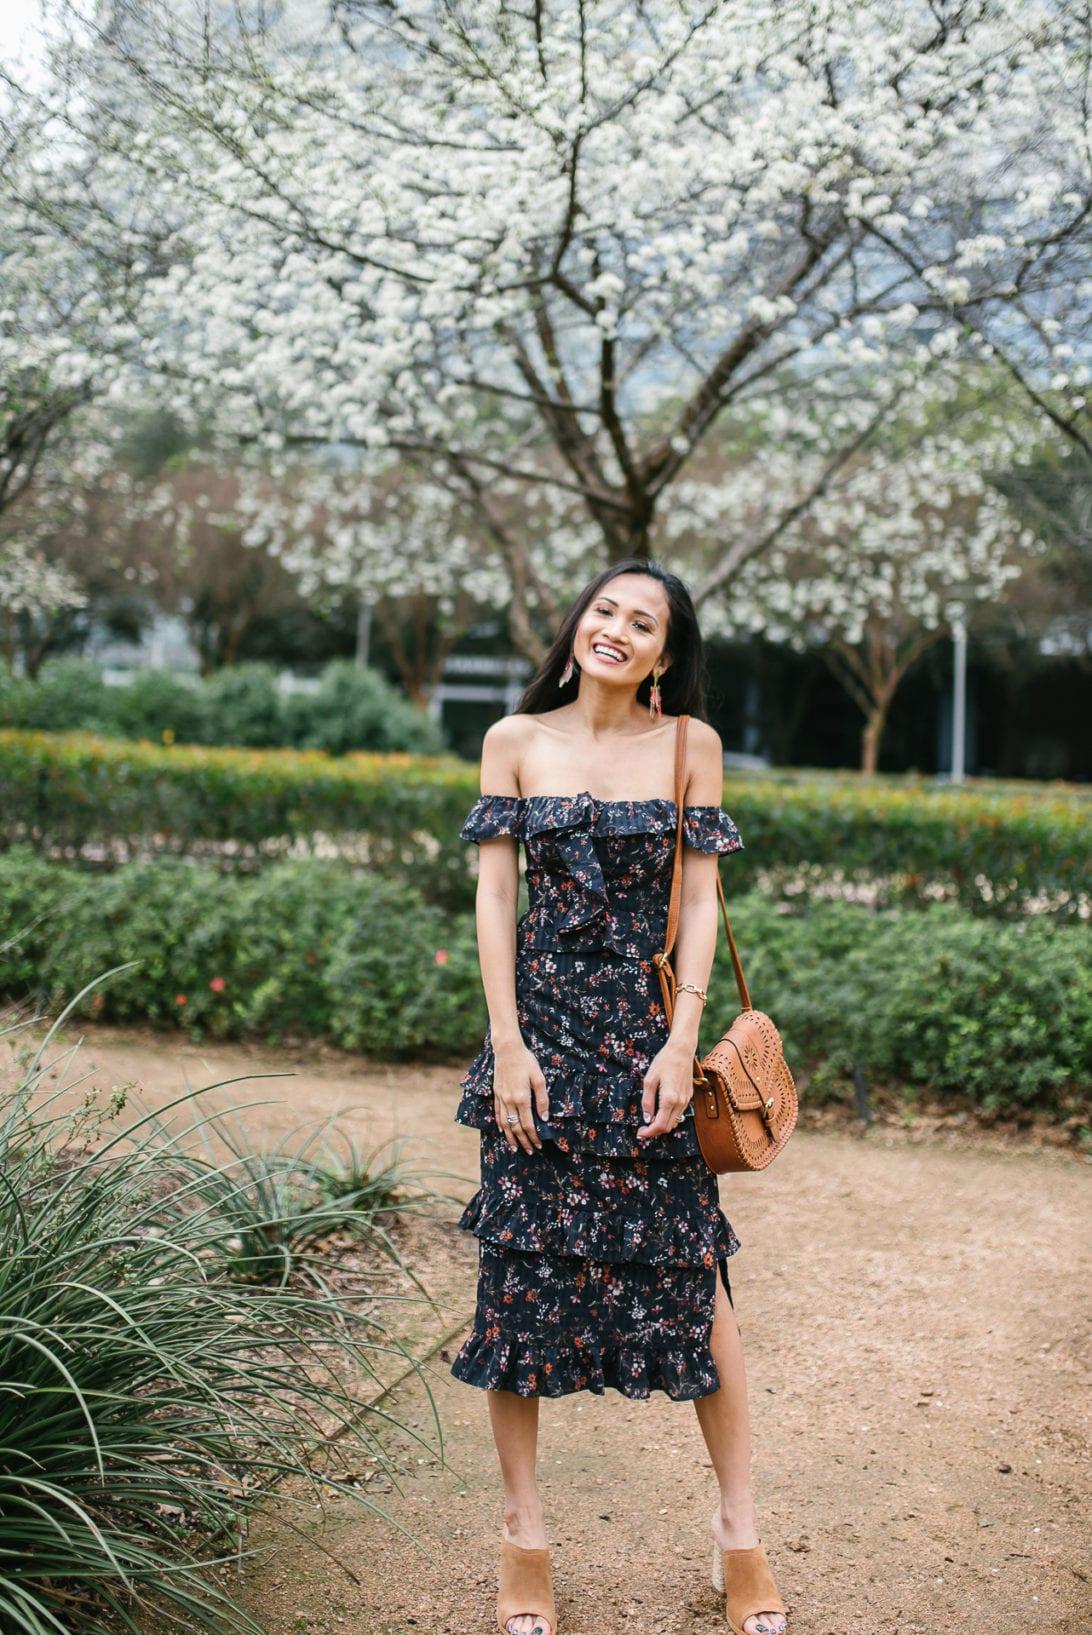 #dswstylesquad, #dsw_partner, #mydsw, spring style, floral dress